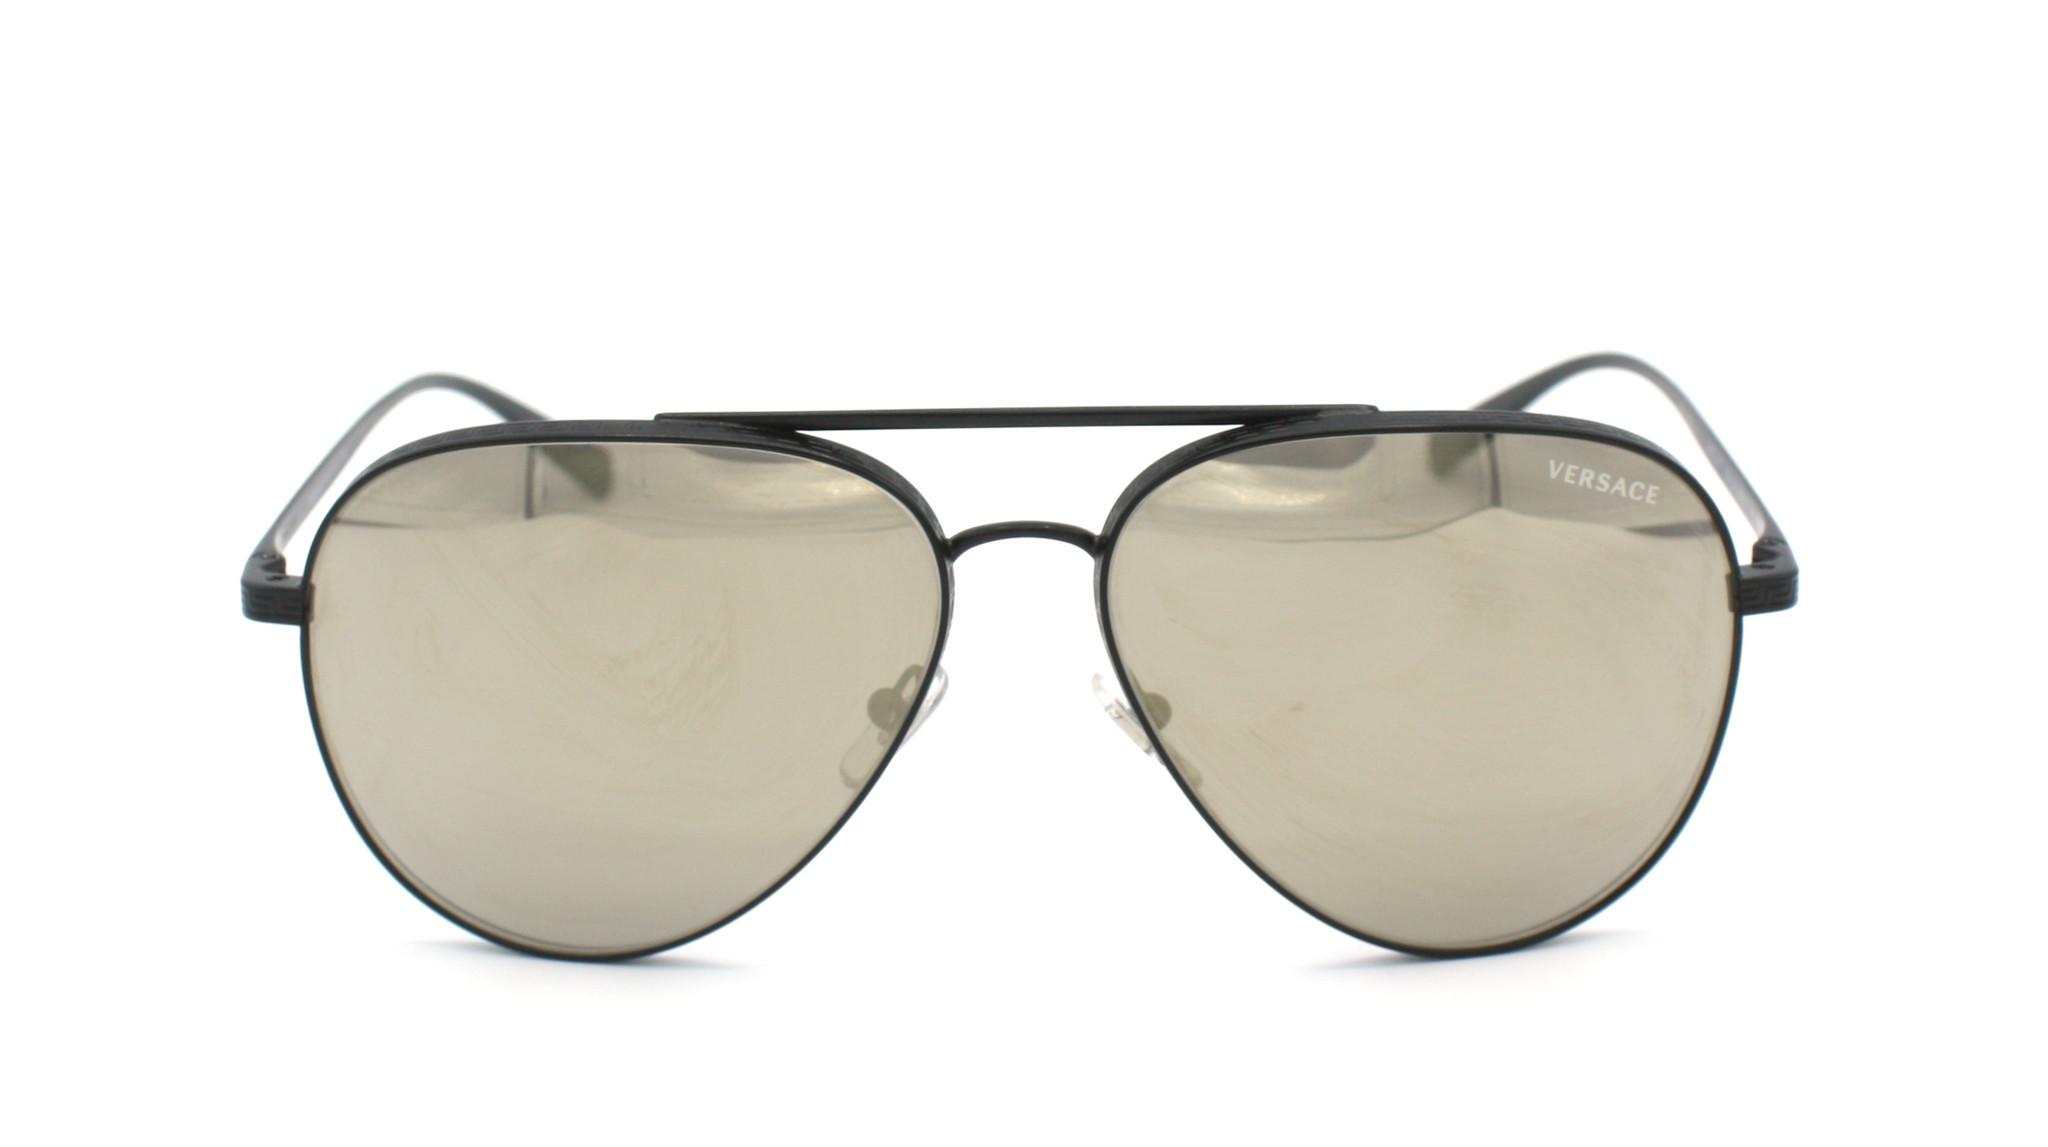 Versace - VE2217 - 12615A59-1